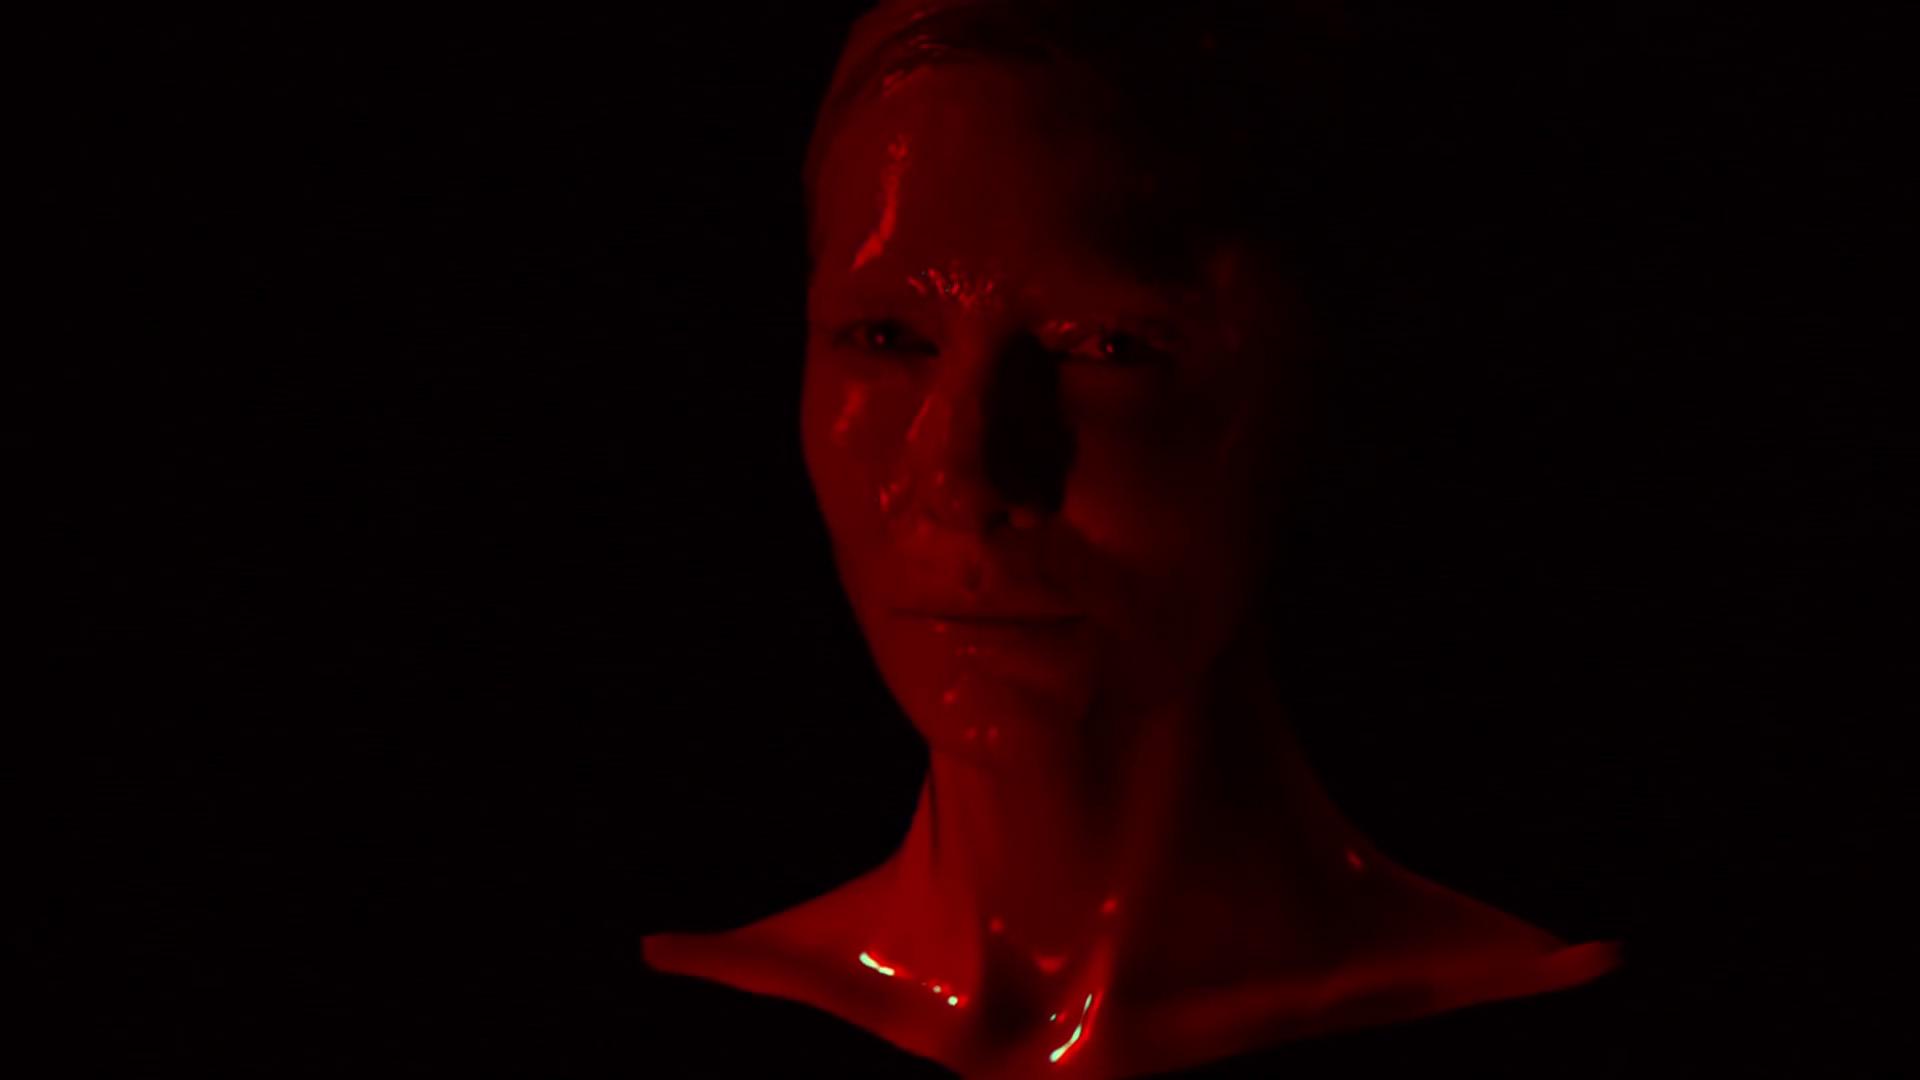 Massive Attack feat. Hope Sandoval - The Spoils - Cate Blanchett